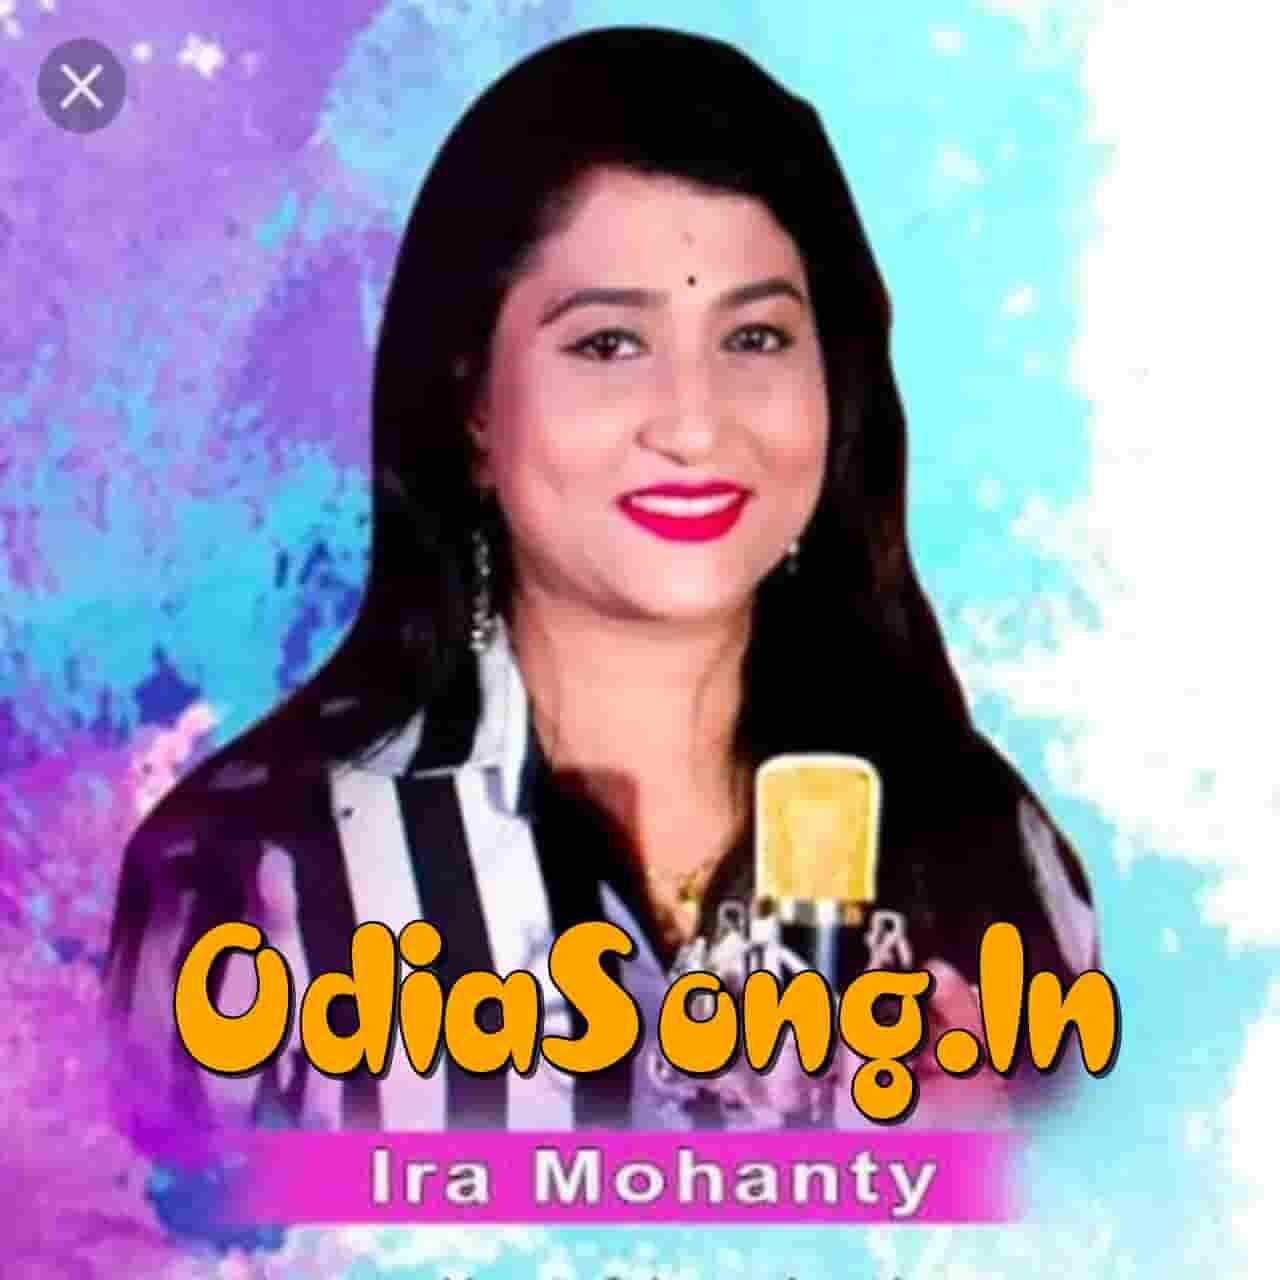 Odhoni Kinili - Ira Mohanty